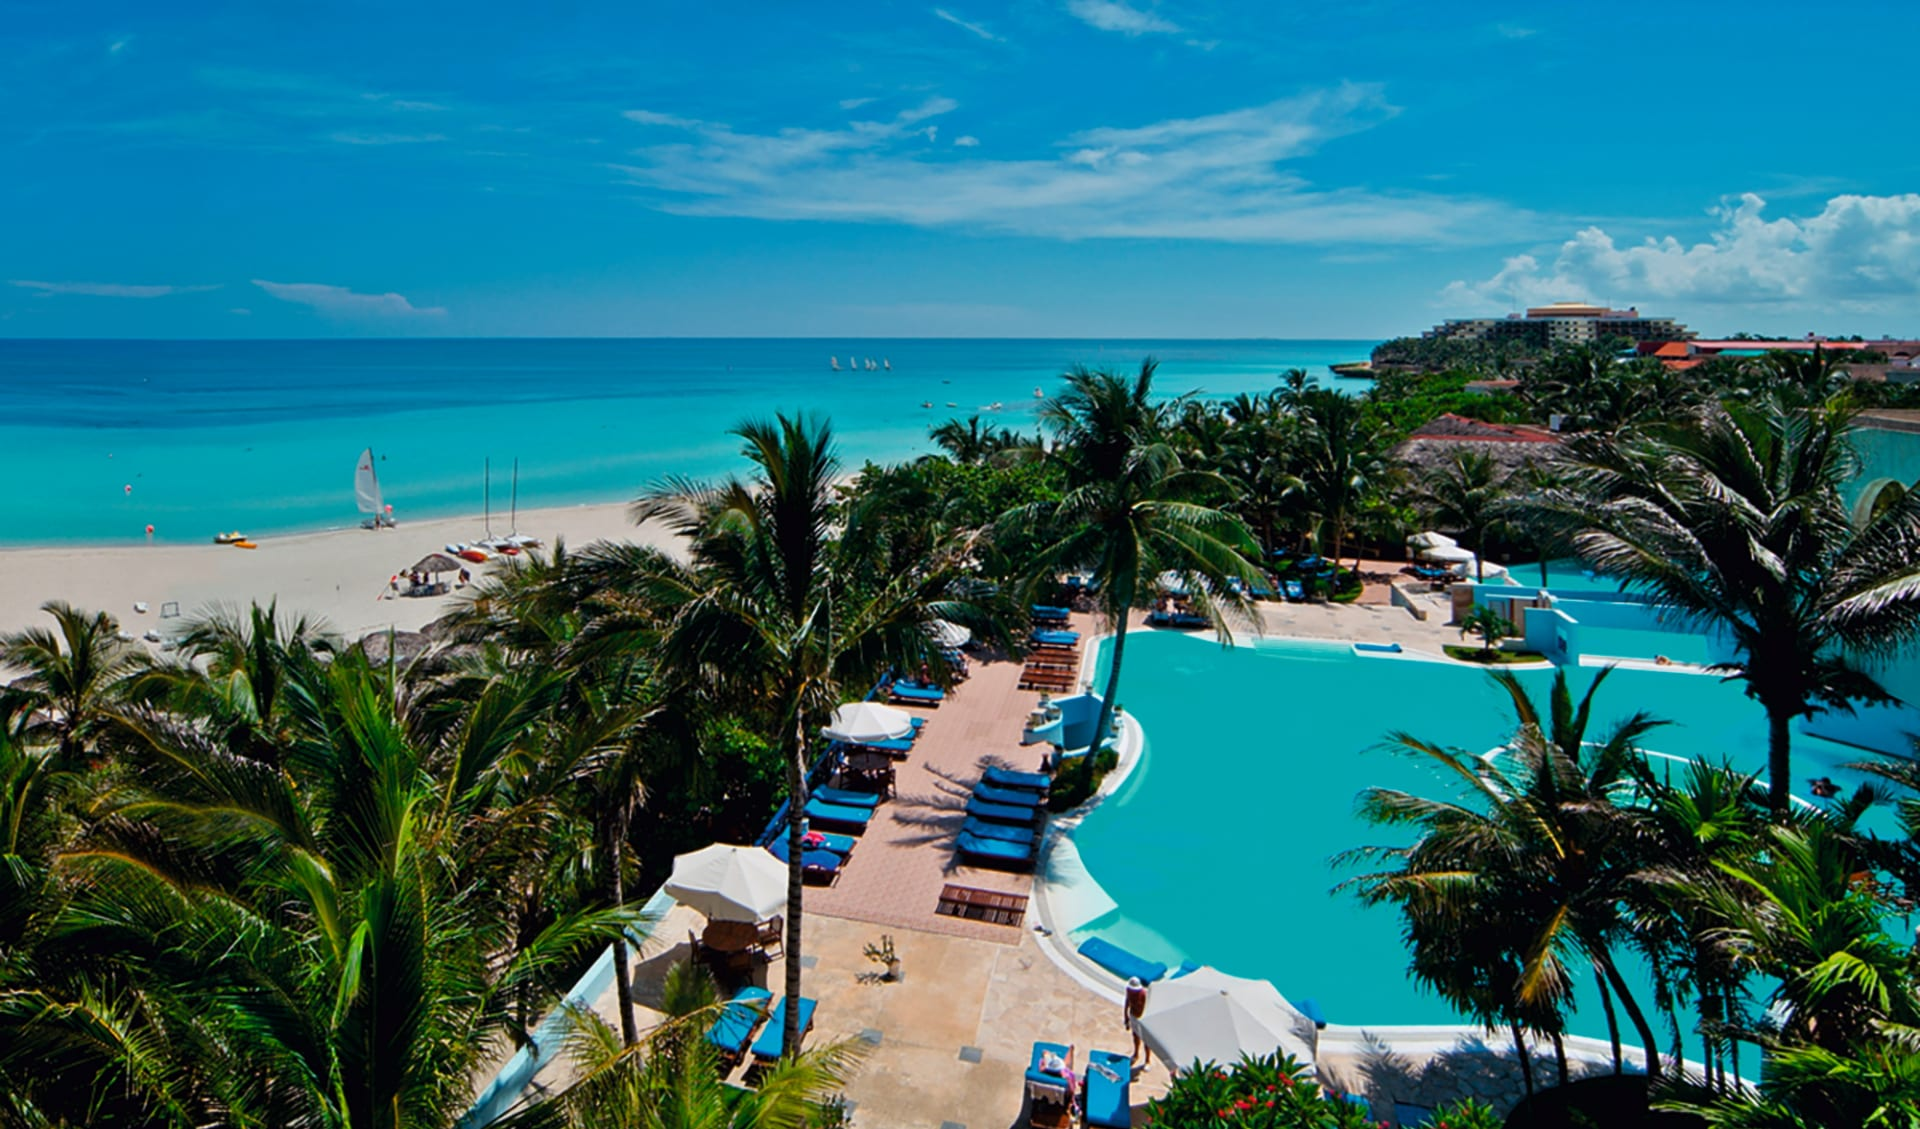 Melia Las Americas in Varadero: pool mélia las américas pool meer